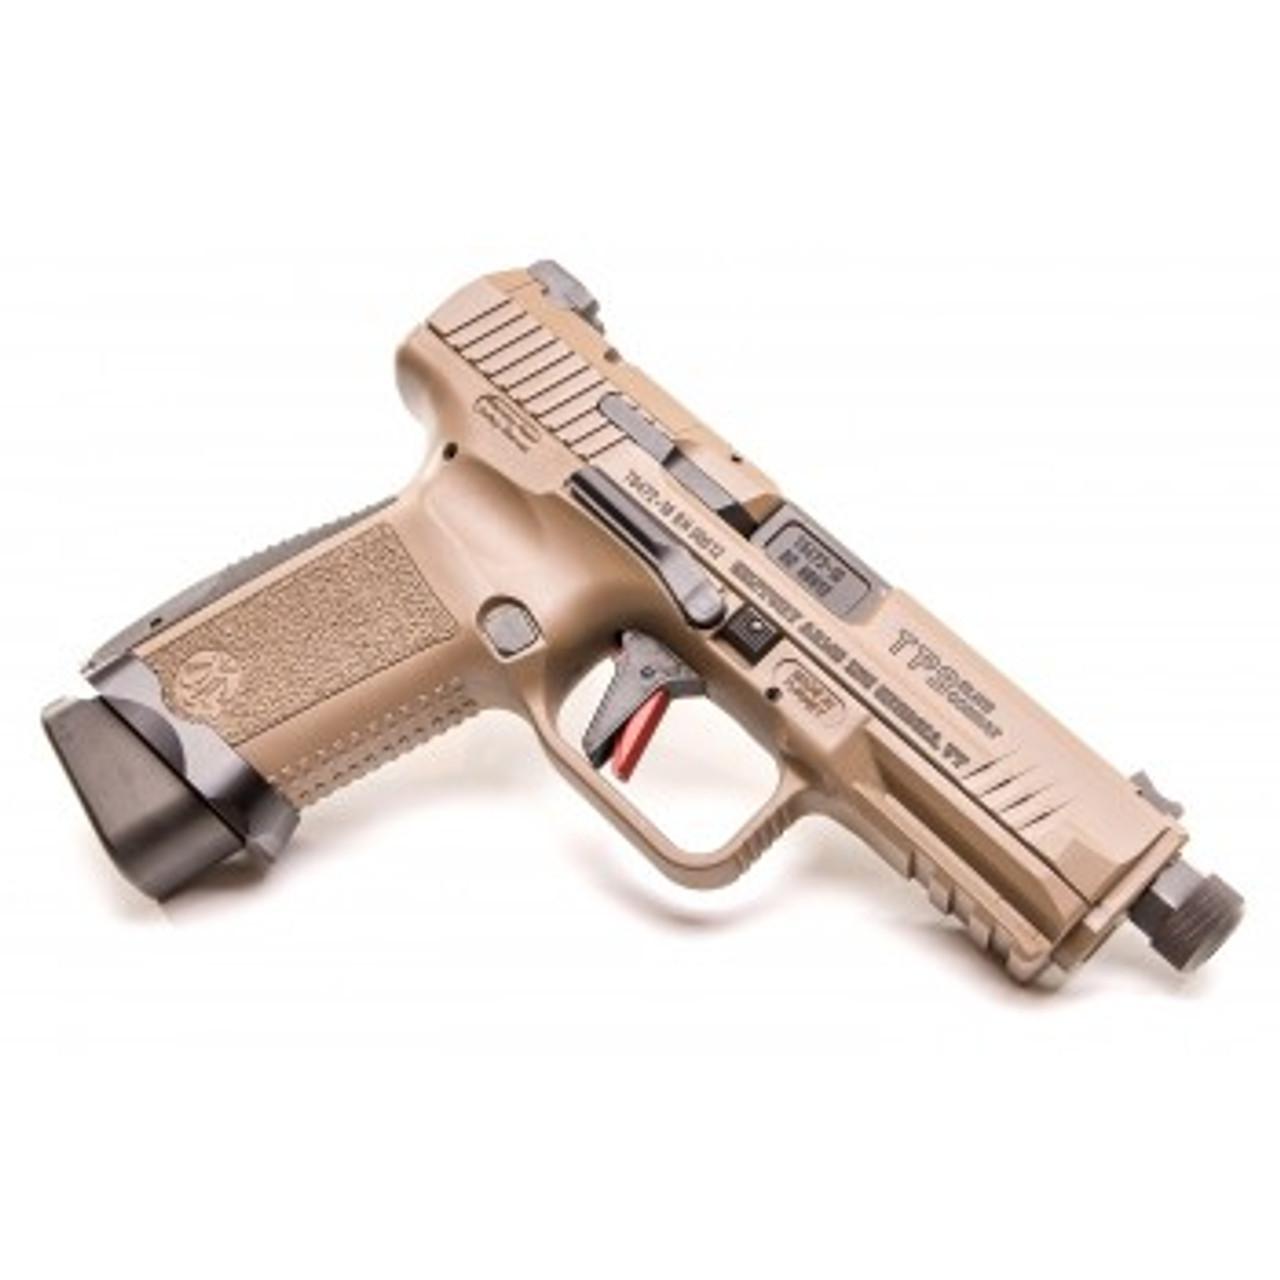 "Canik TPSF Elite Combat Model Semi-Auto Pistol, 9mm, 4.73"" Barrel, 10 Rounds, Polymer Frame"